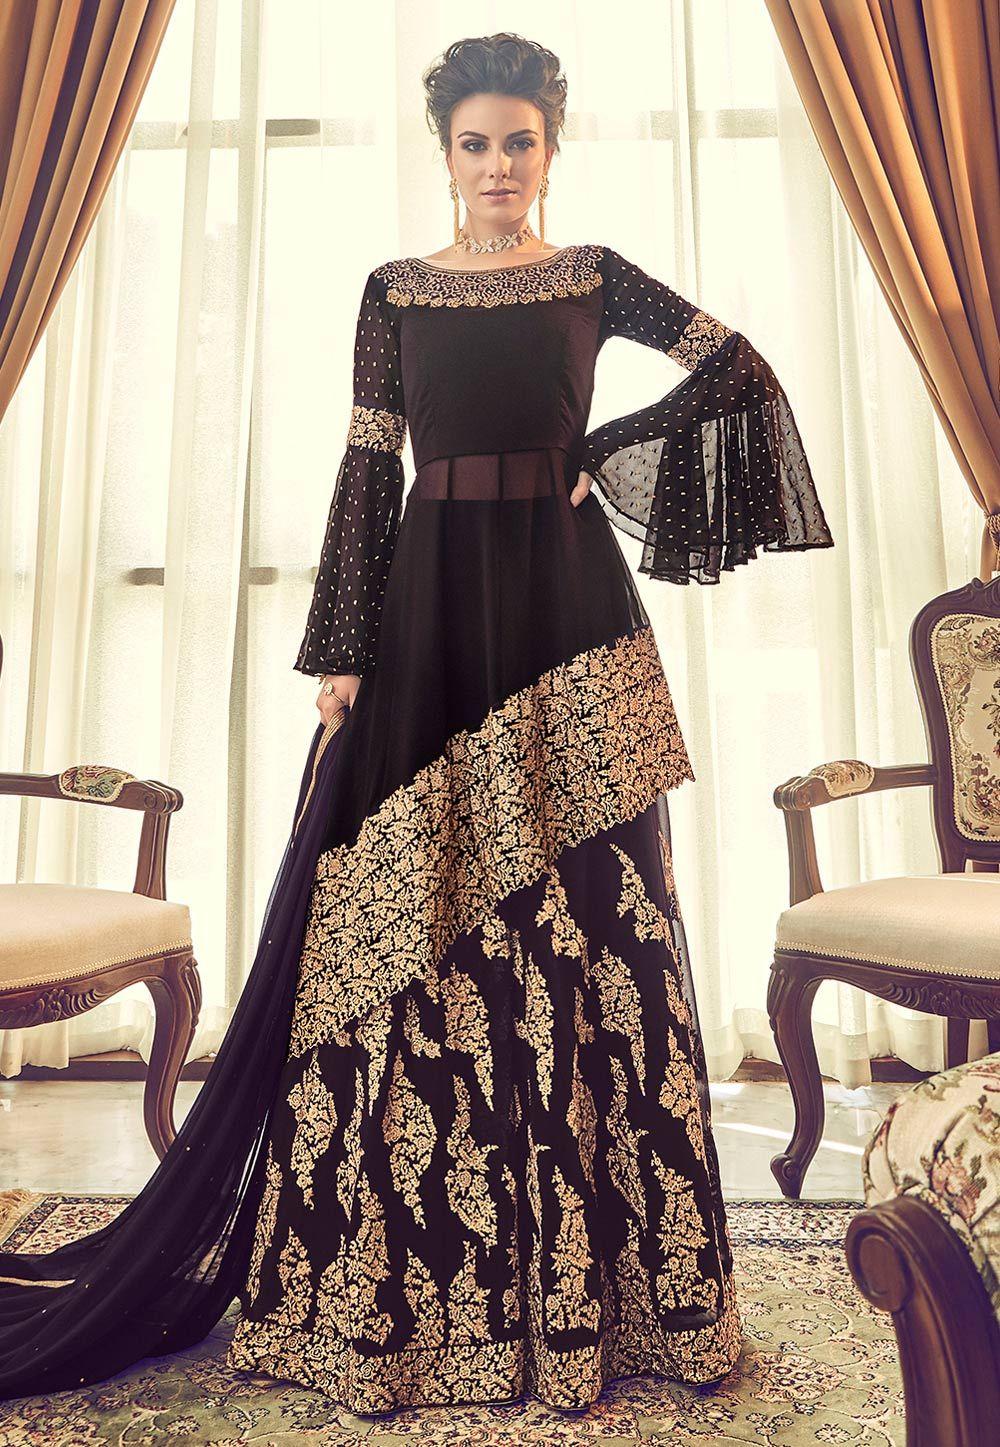 54a55395d1f16 Buy Black Georgette Embroidered Designer Sharara Suit 165803 online at lowest  price from huge collection of salwar kameez at Indianclothstore.com.